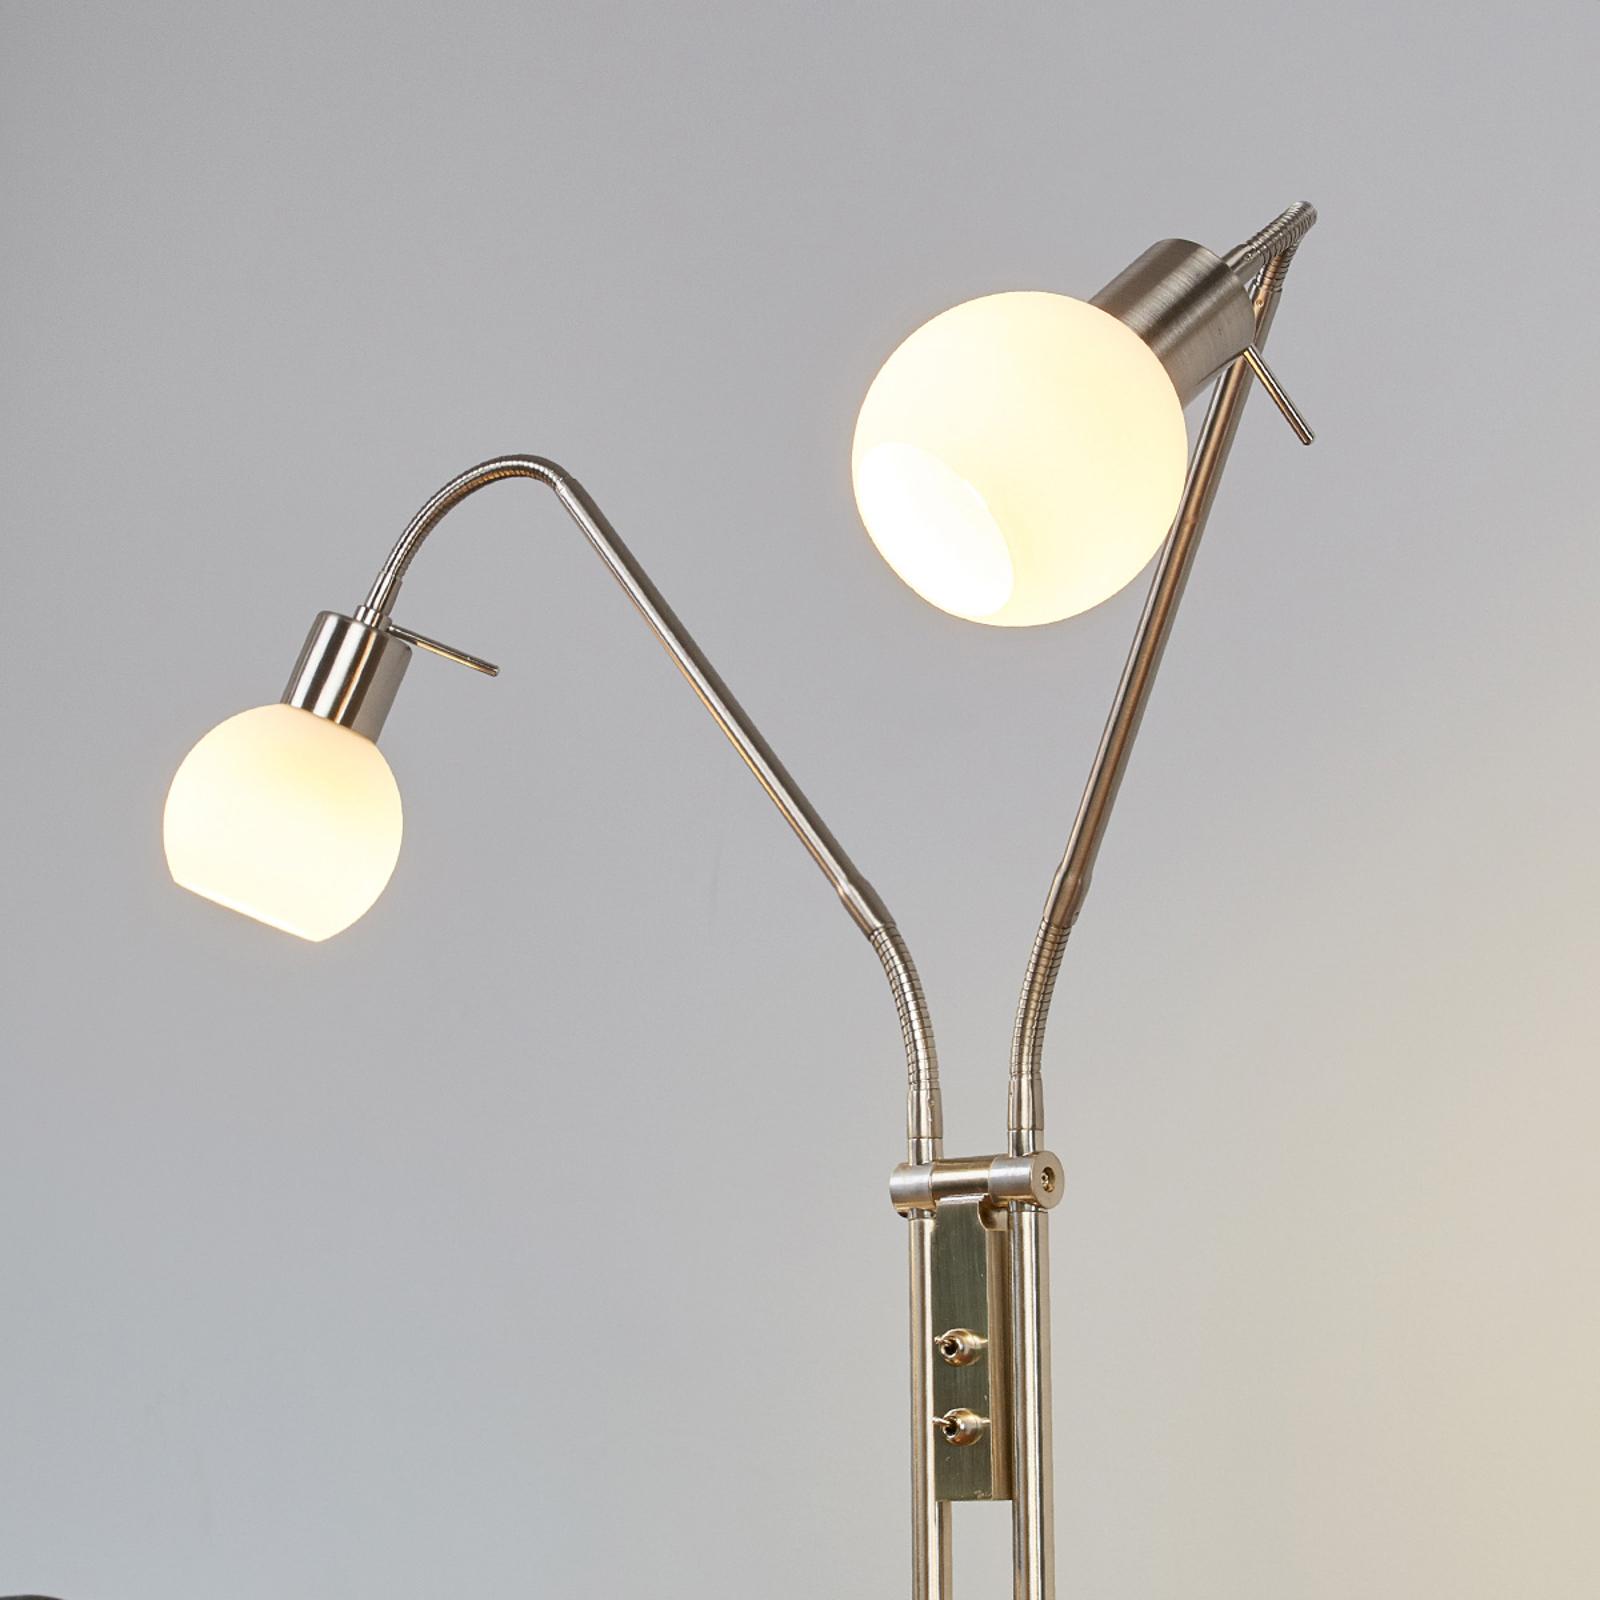 2-punktowa lampa stojąca LED ELAINA, matowy nikiel